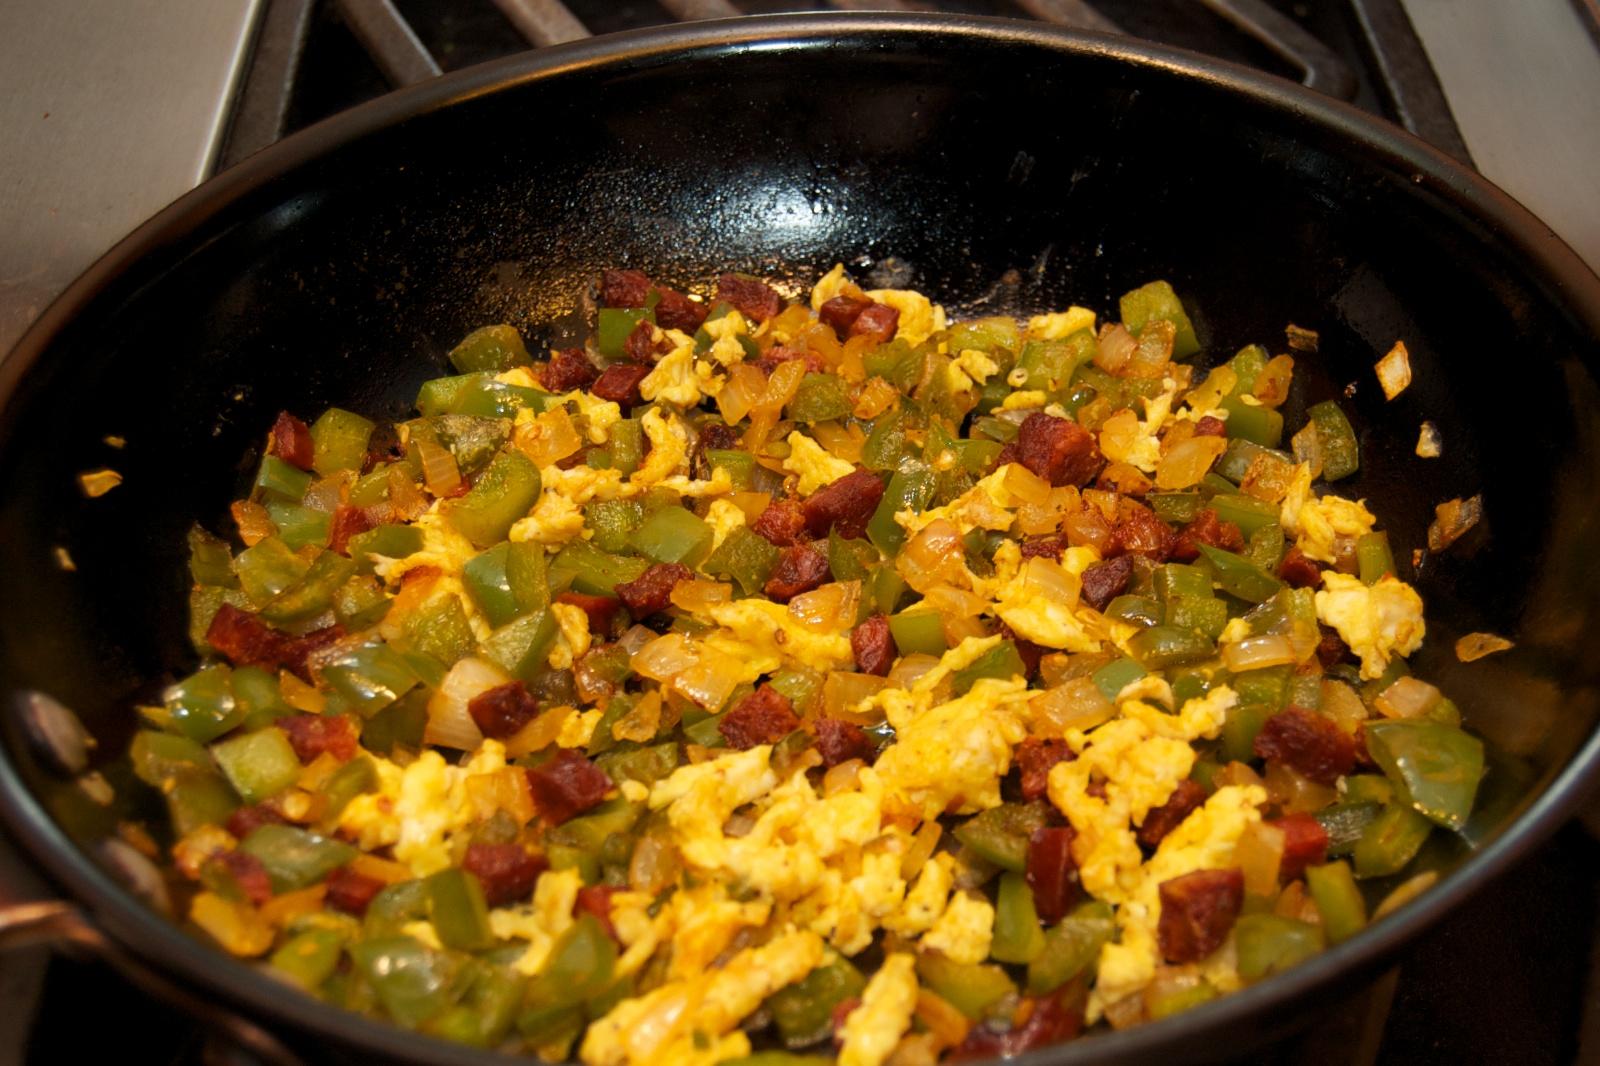 http://blog.rickk.com/food/2013/11/20/ate.2013.11.19.c2.jpg